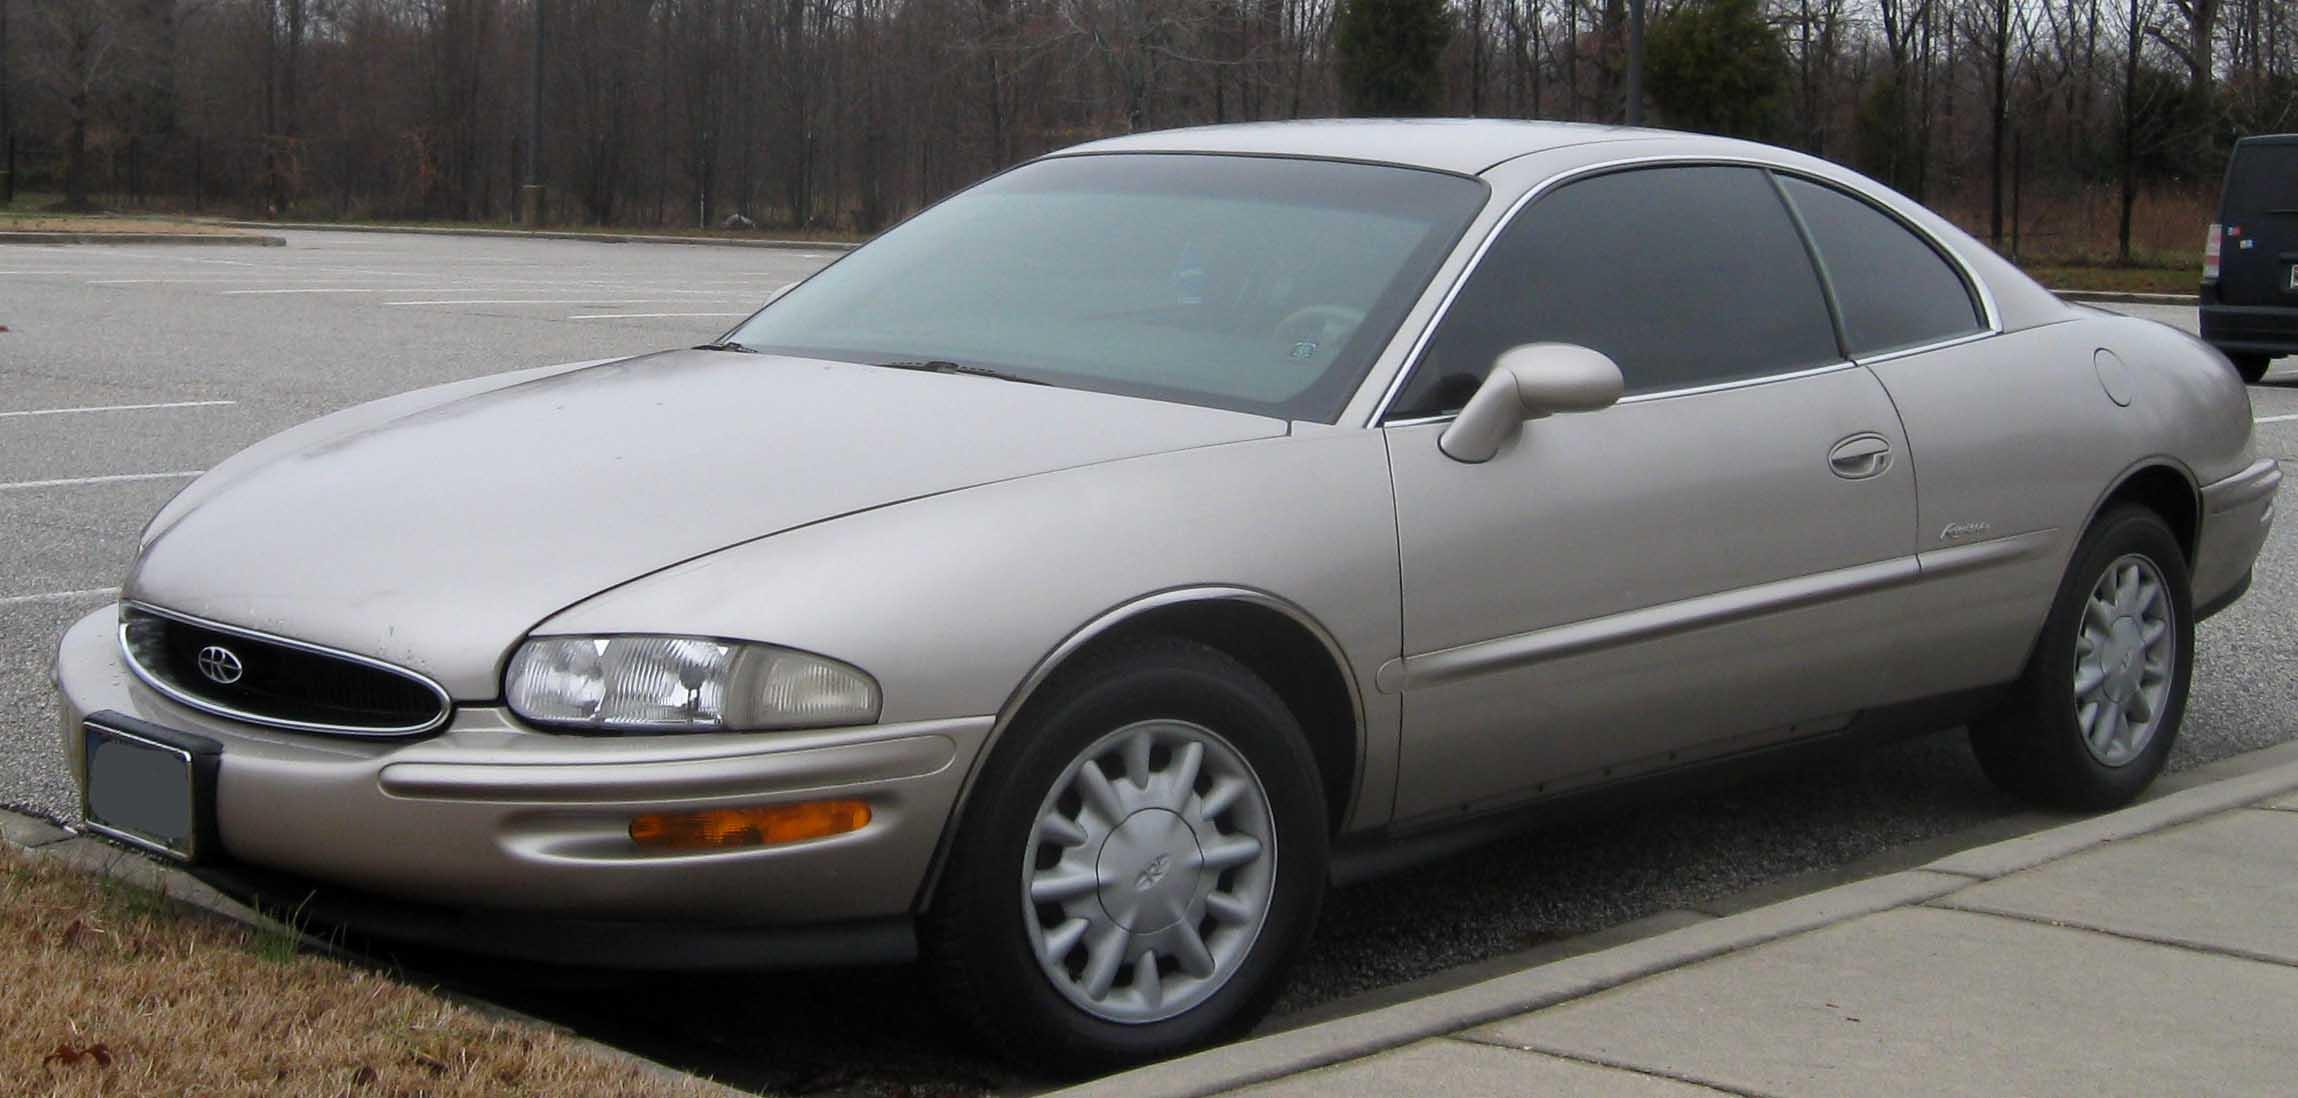 Buick Riviera VIII 1995 - 1999 Coupe #8